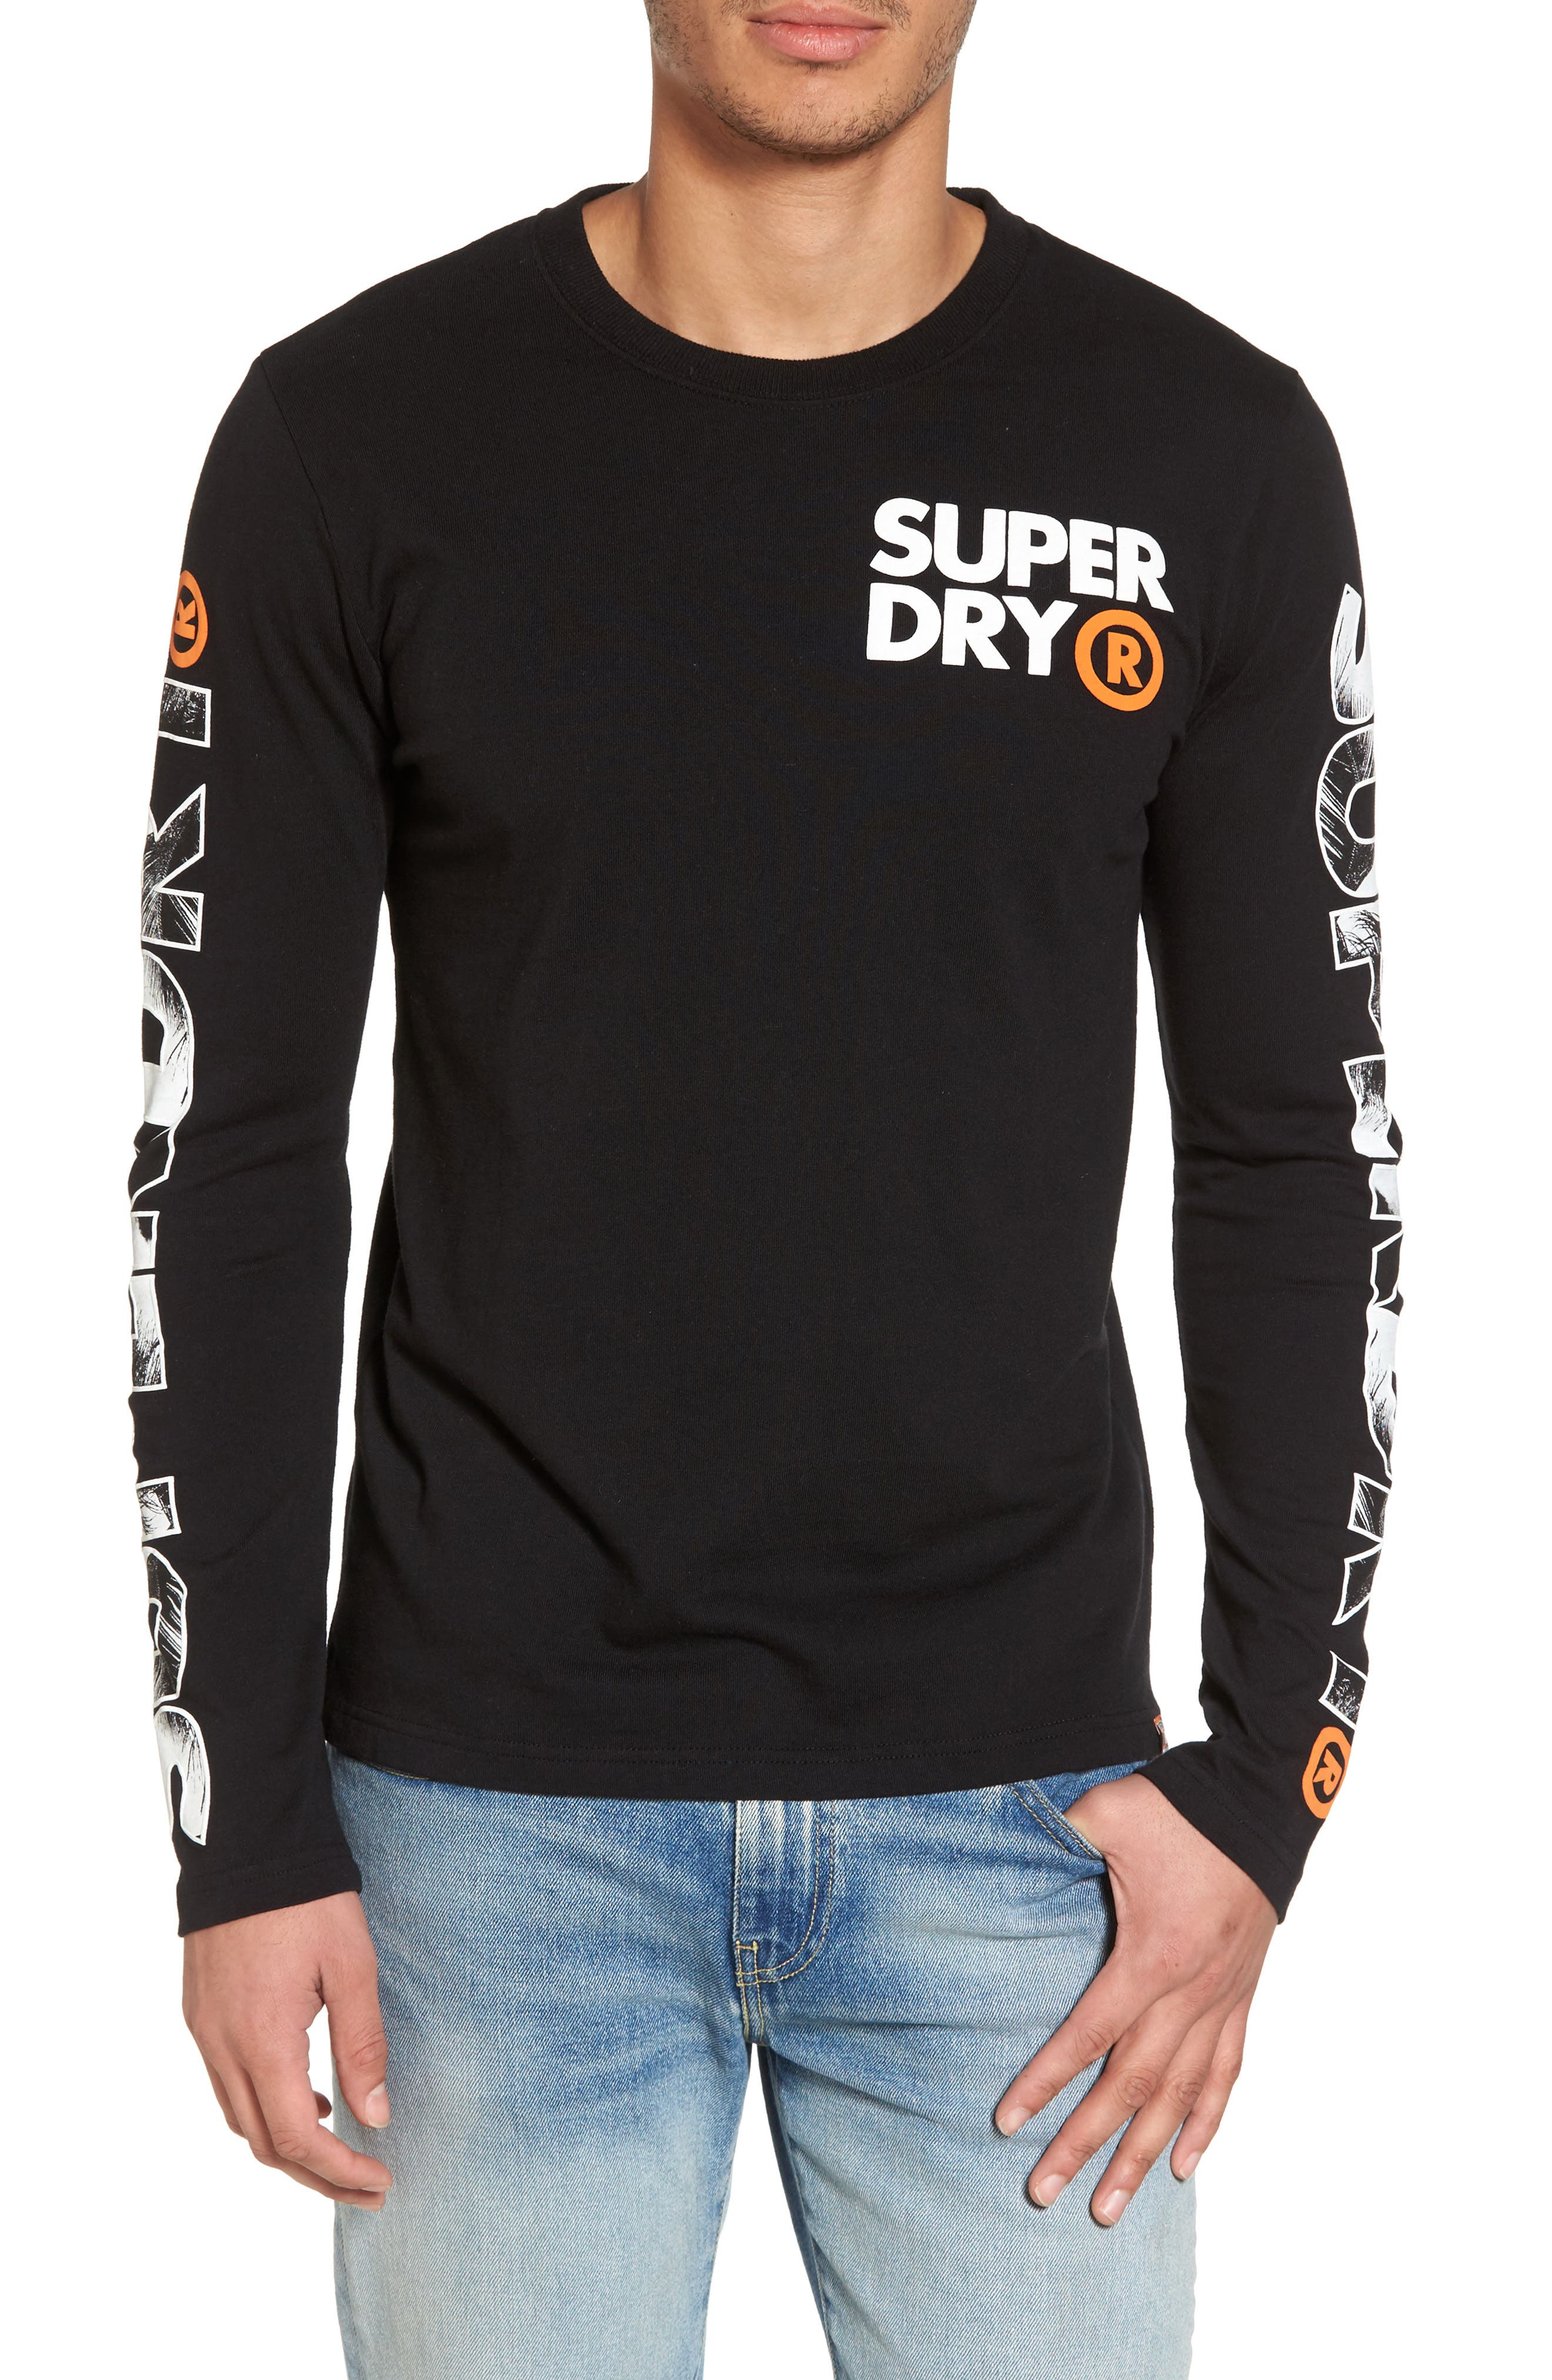 Hyper T-Shirt,                         Main,                         color, Black